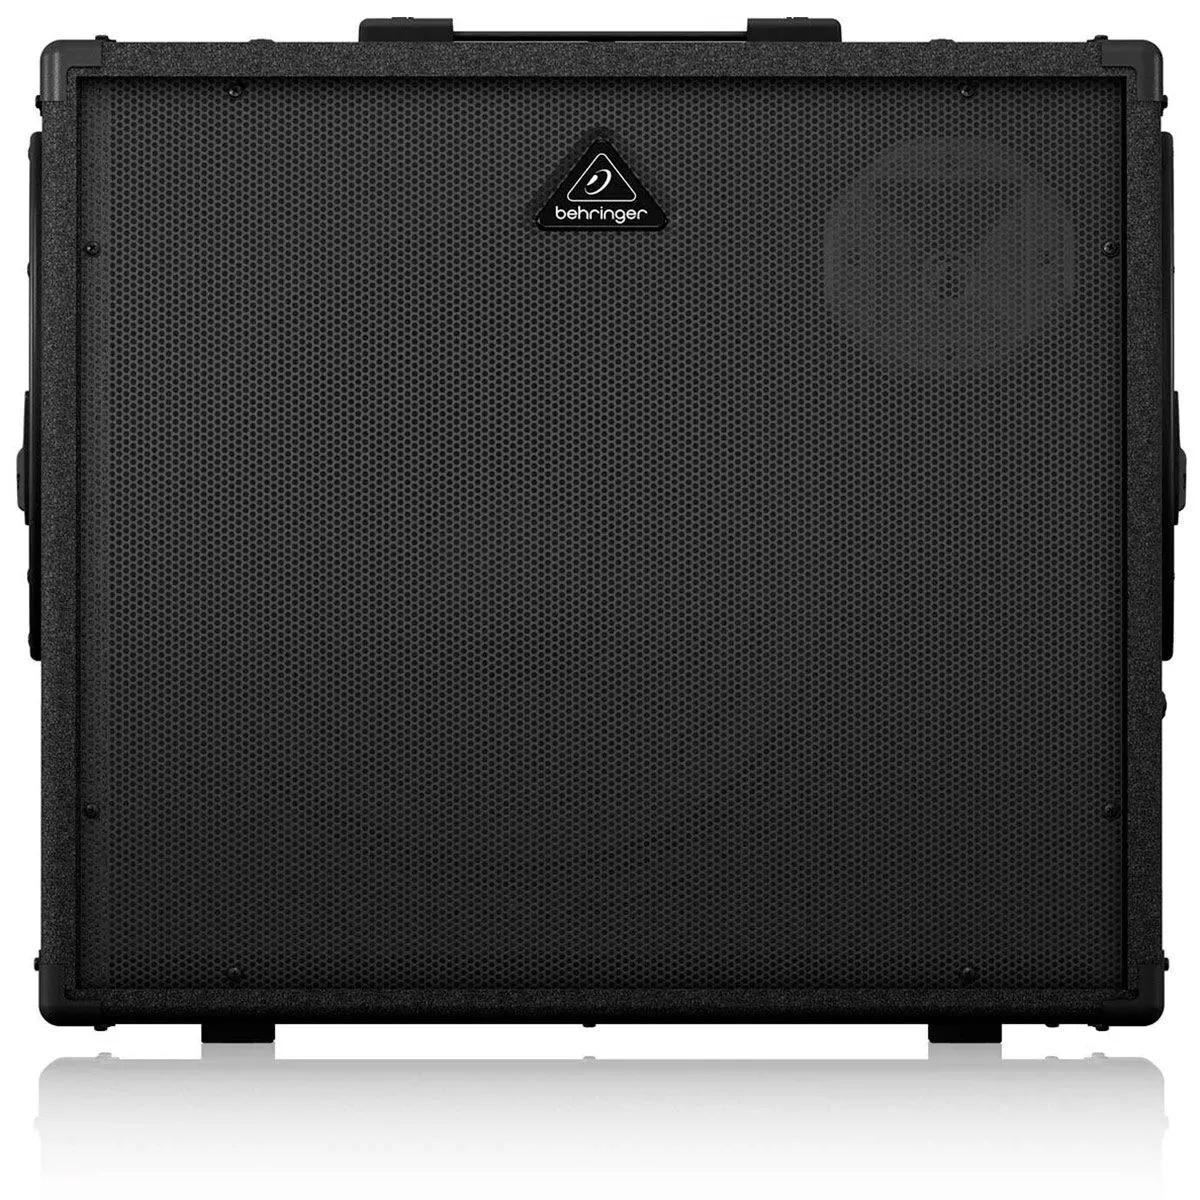 Caixa Amplificada Behringer Ultratone K3000FX 300W 1x15